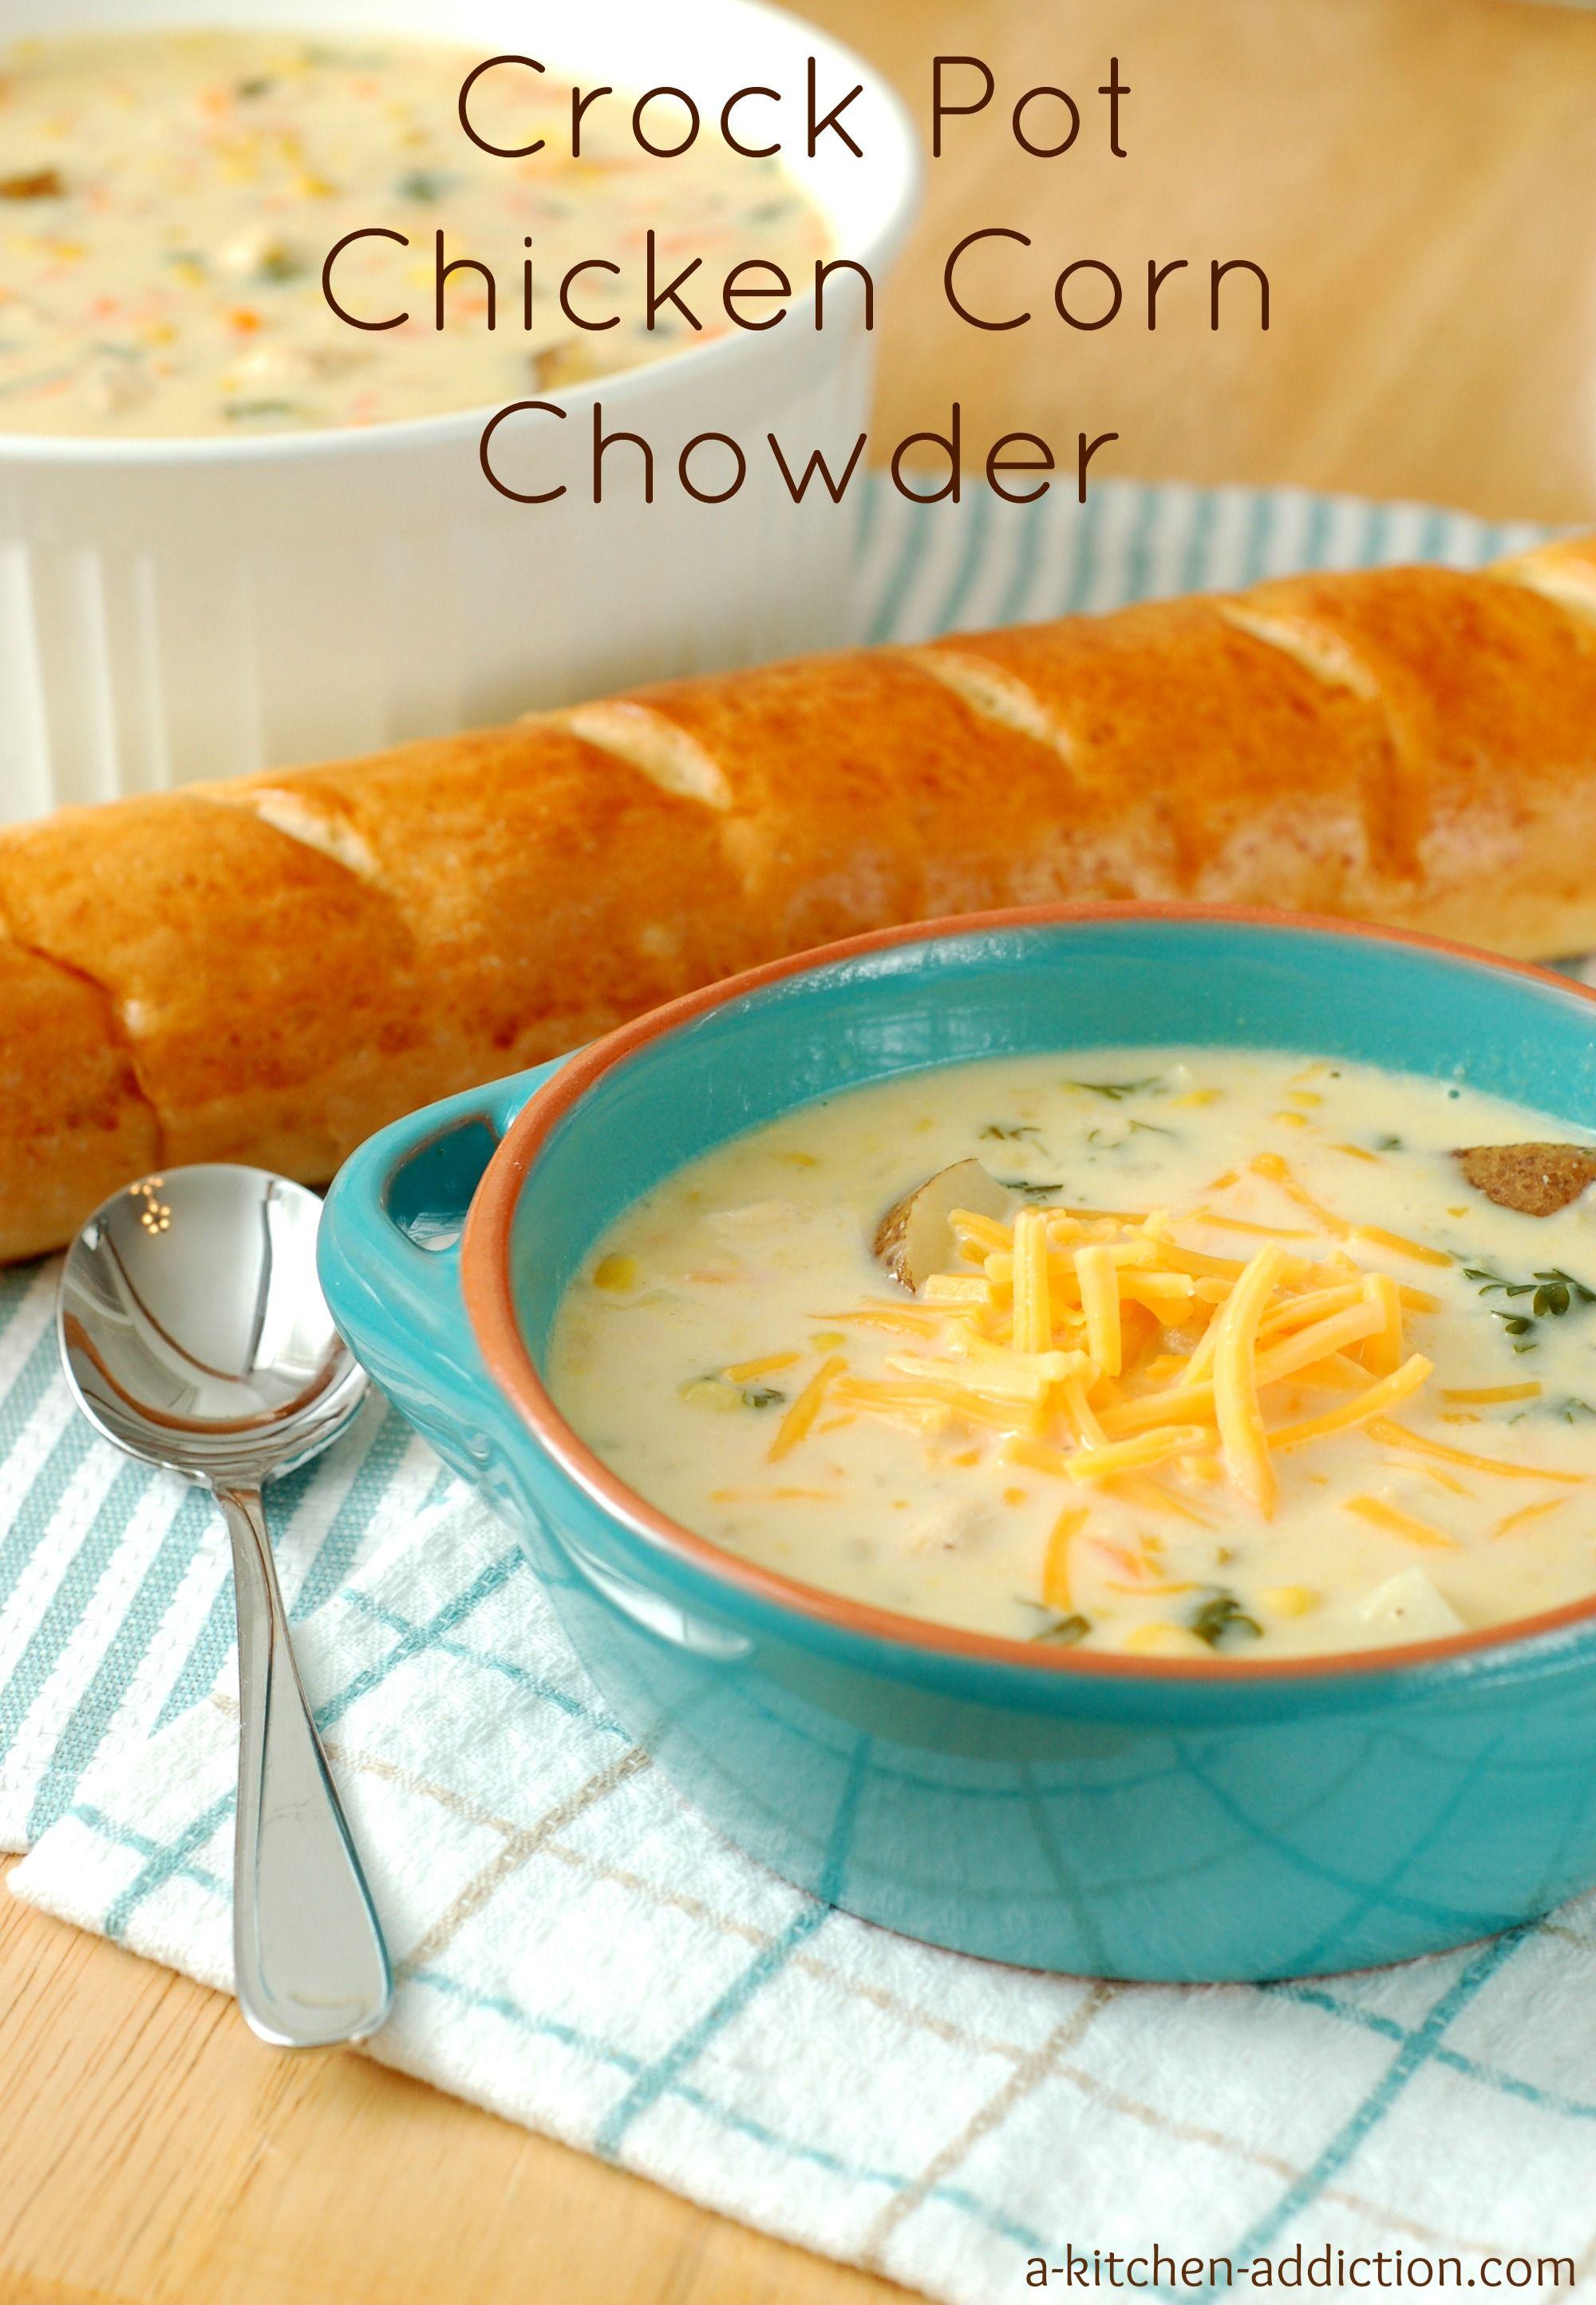 Crock Pot Chicken Corn Chowder from @akitchenaddict